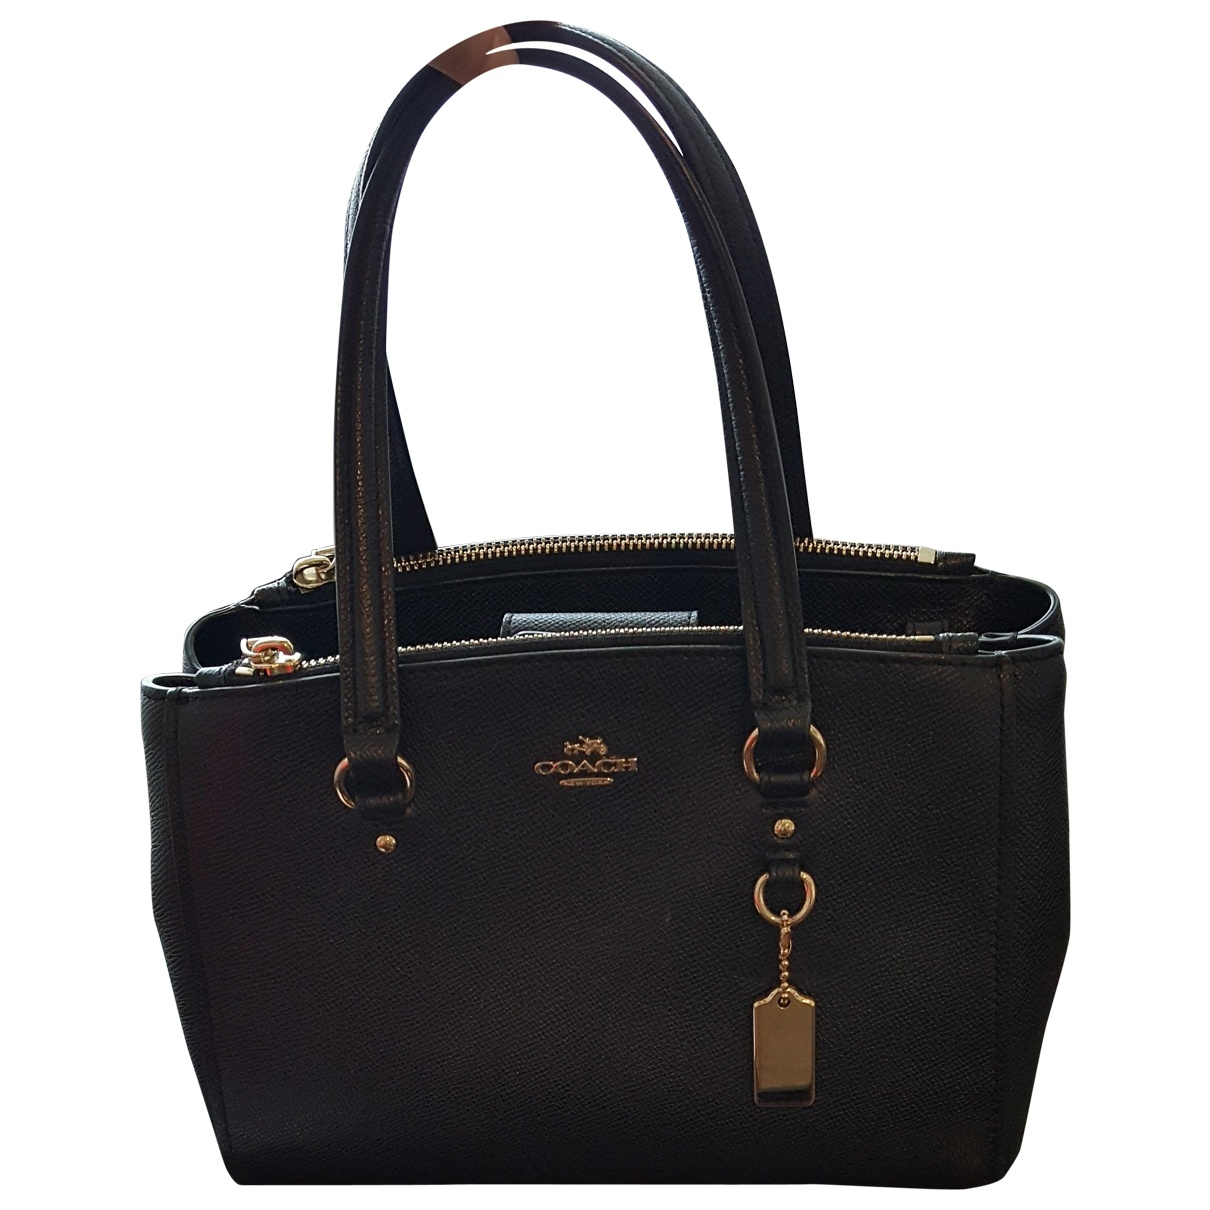 Coach \N Black Leather handbag for Women \N